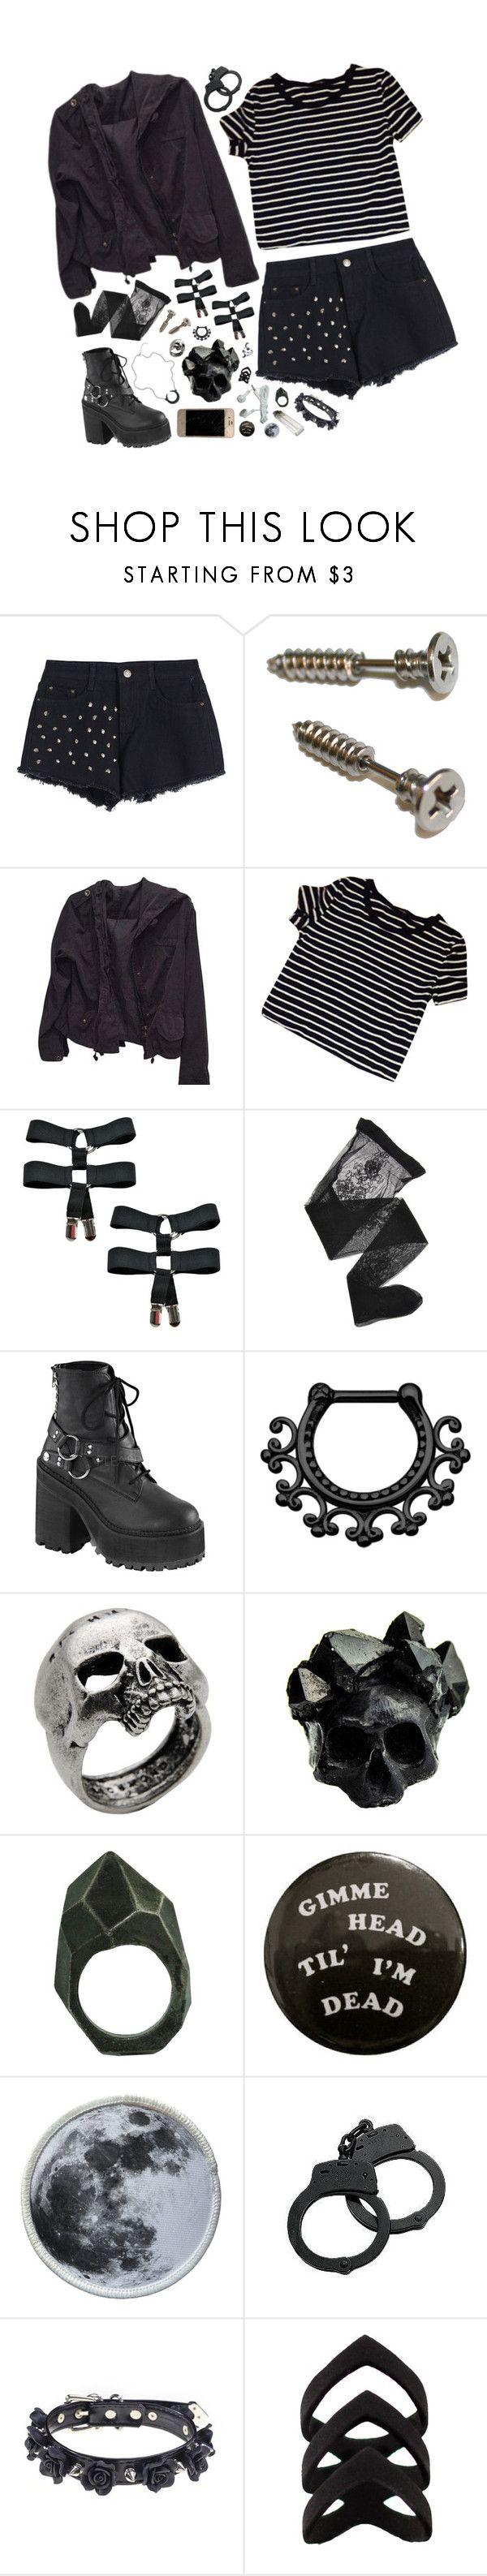 """[ black + white ]"" by sadkingloki ❤ liked on Polyvore featuring Brandy Melville, Emporio Armani, Demonia, John Richmond, Macabre Gadgets and Lady Grey"